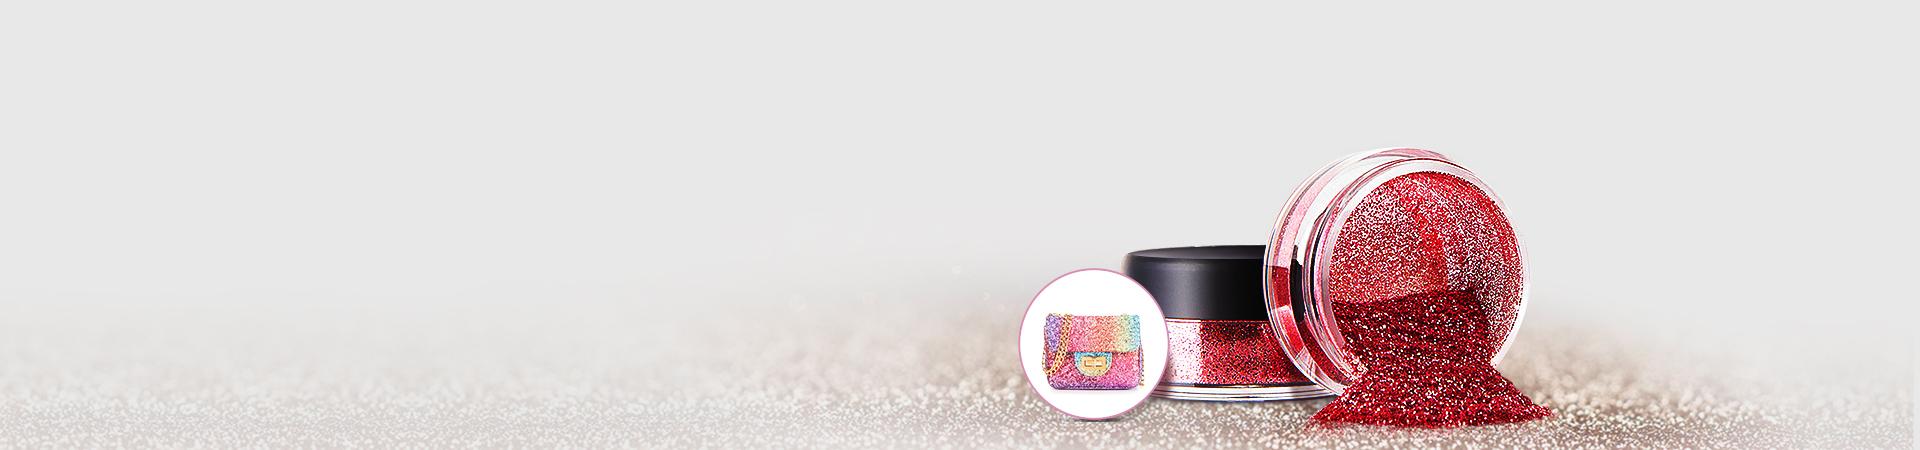 category-cosmetic glitter-Xucai-img